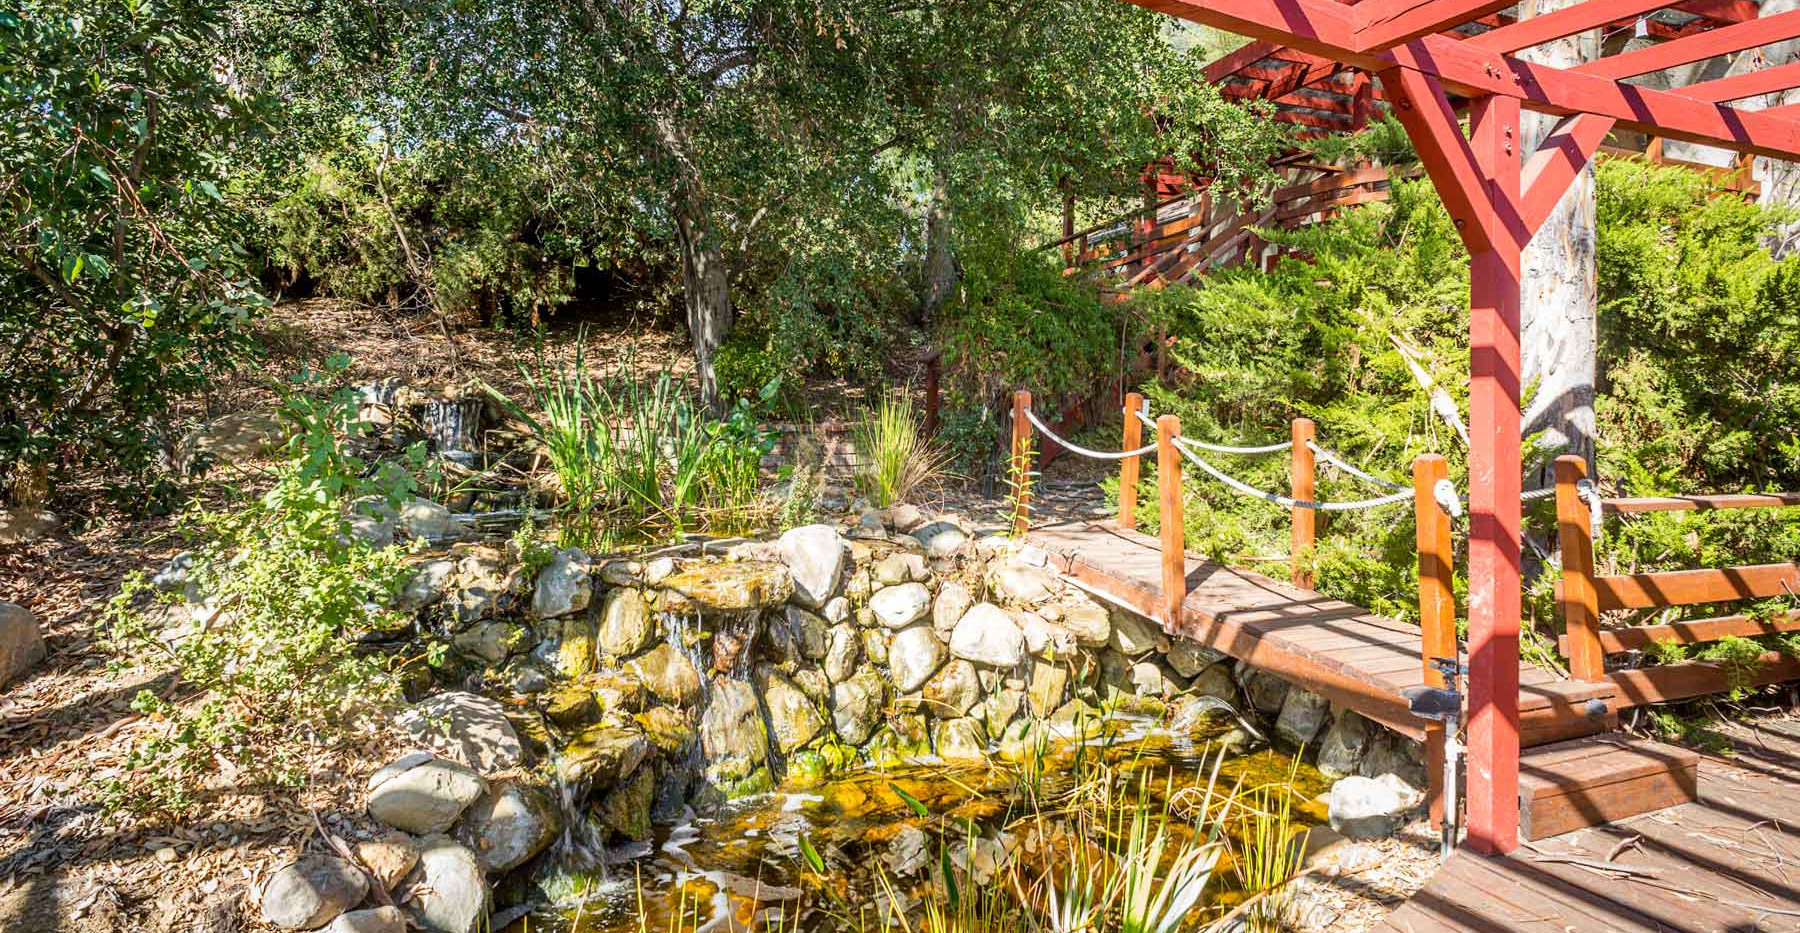 20161005_23734_ValleyView_Pond2_MLS.jpg